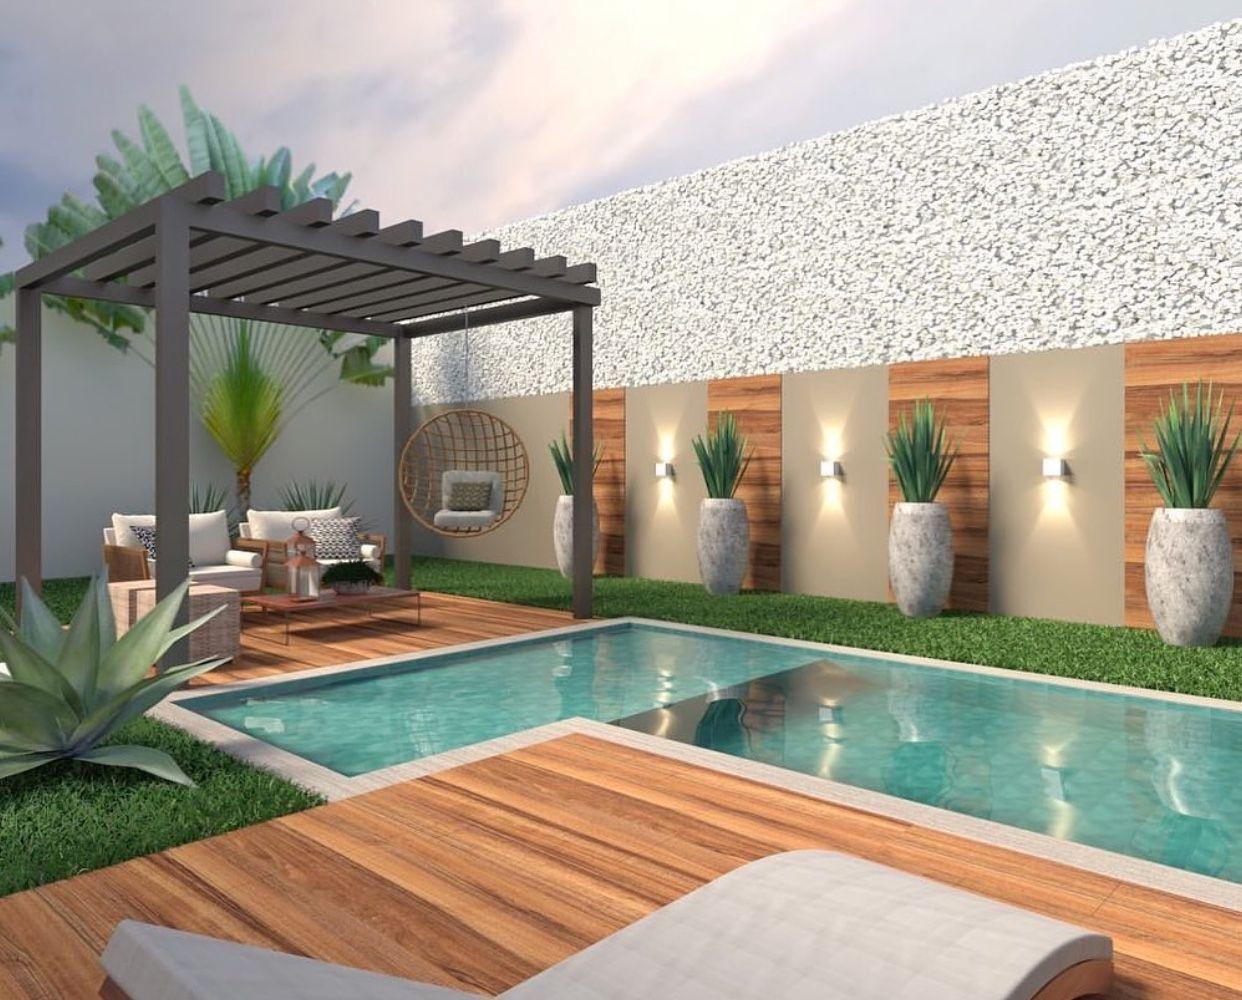 Swimming Pool Idea Luxury Garden Design Small Backyard Pools Small Pool Design Backyard modern pool ideas